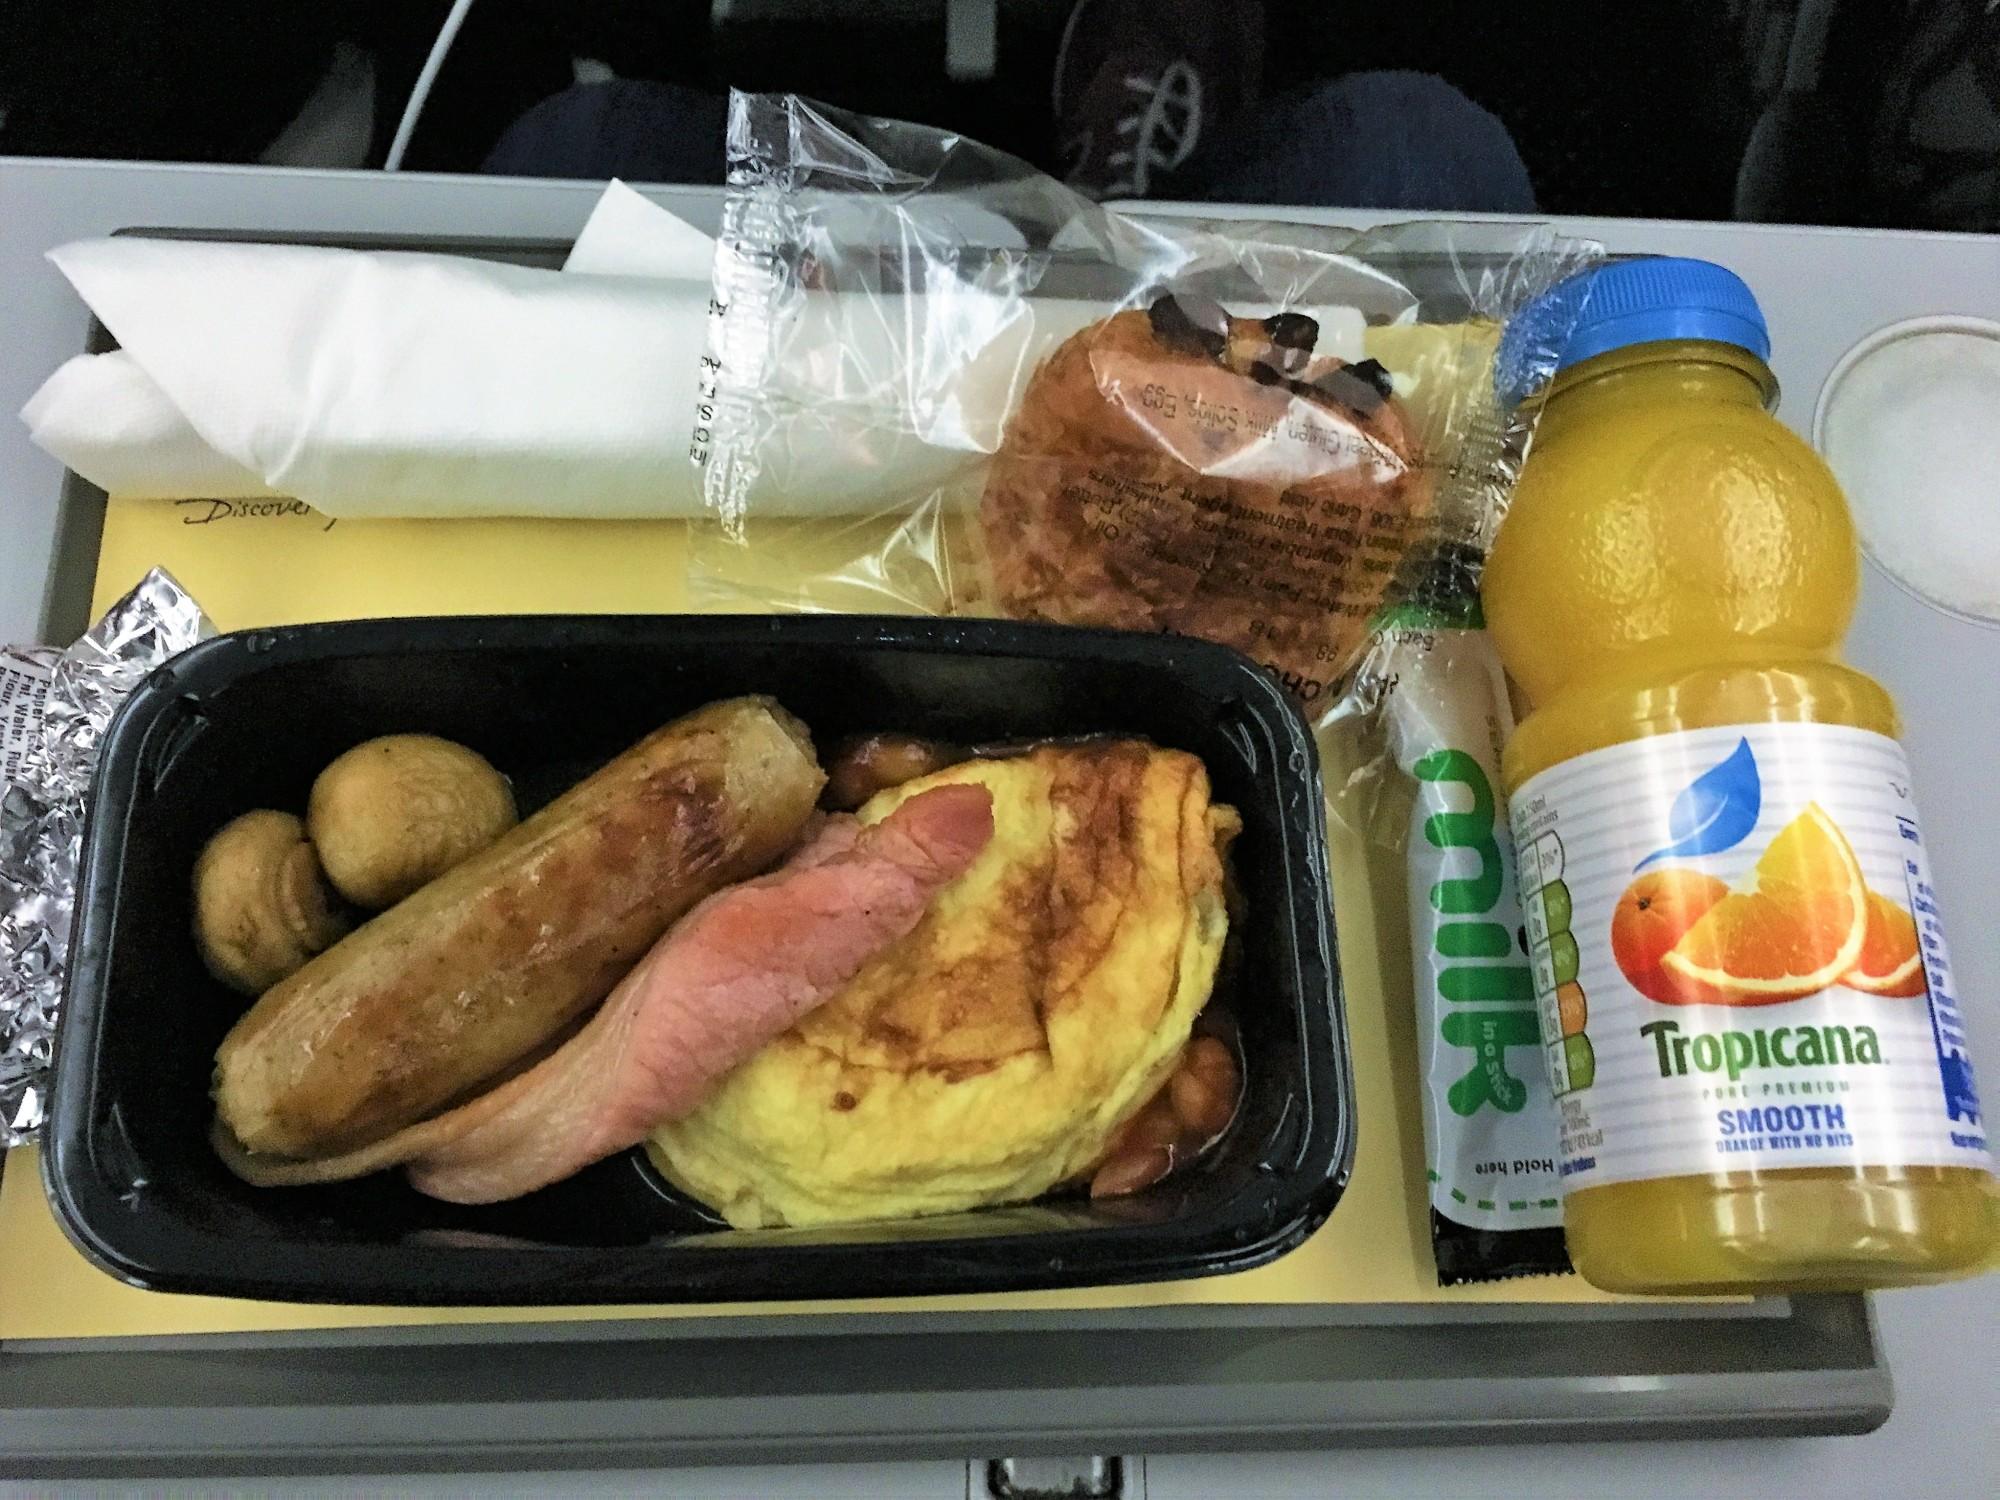 Breakfast on in TUI Premium on the Dreamliner